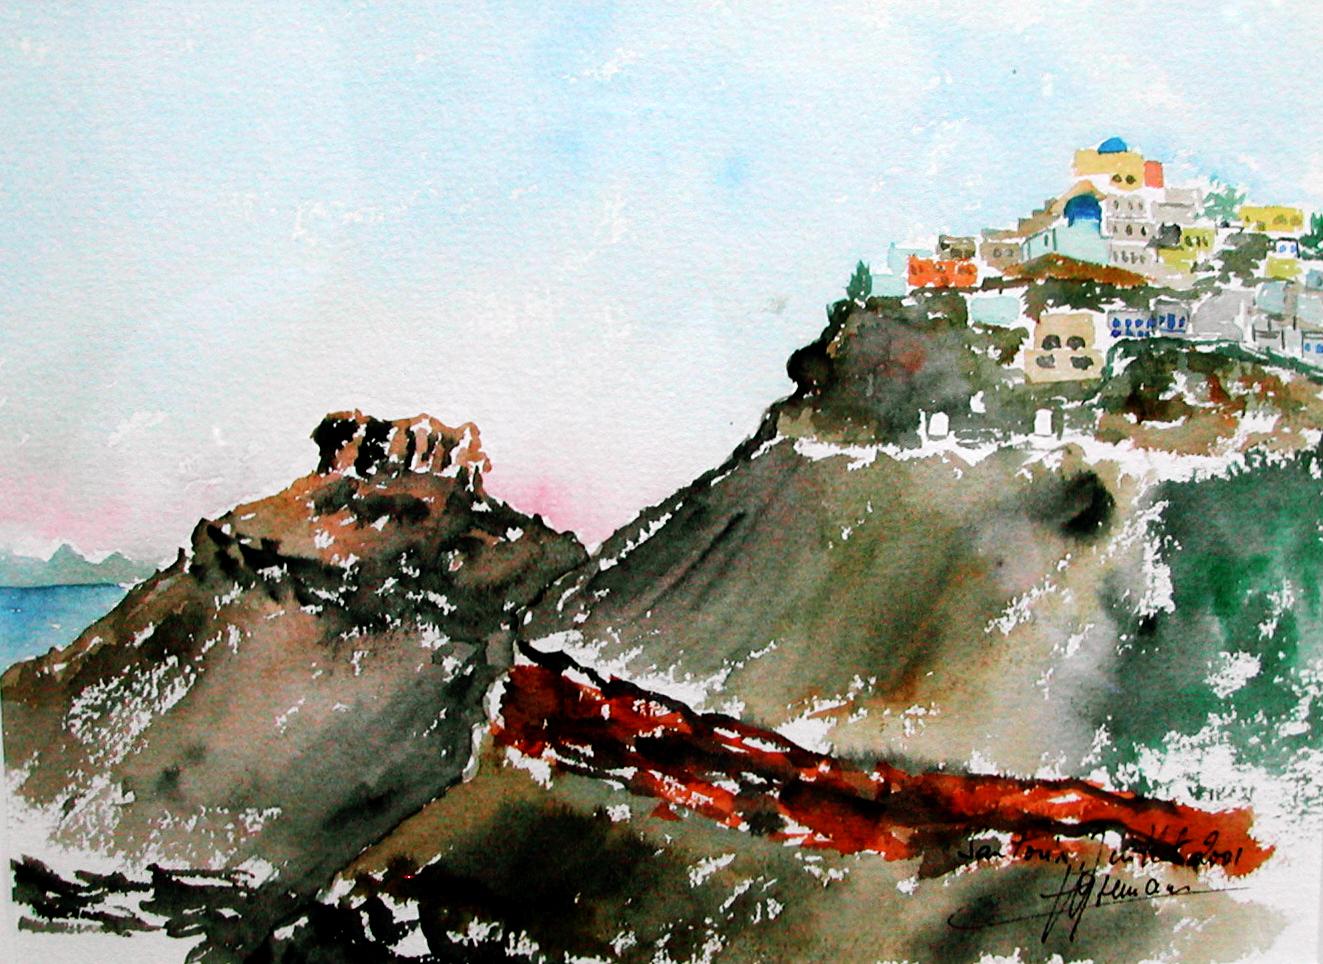 GRECE roches volcaniques de Santorin.jpg